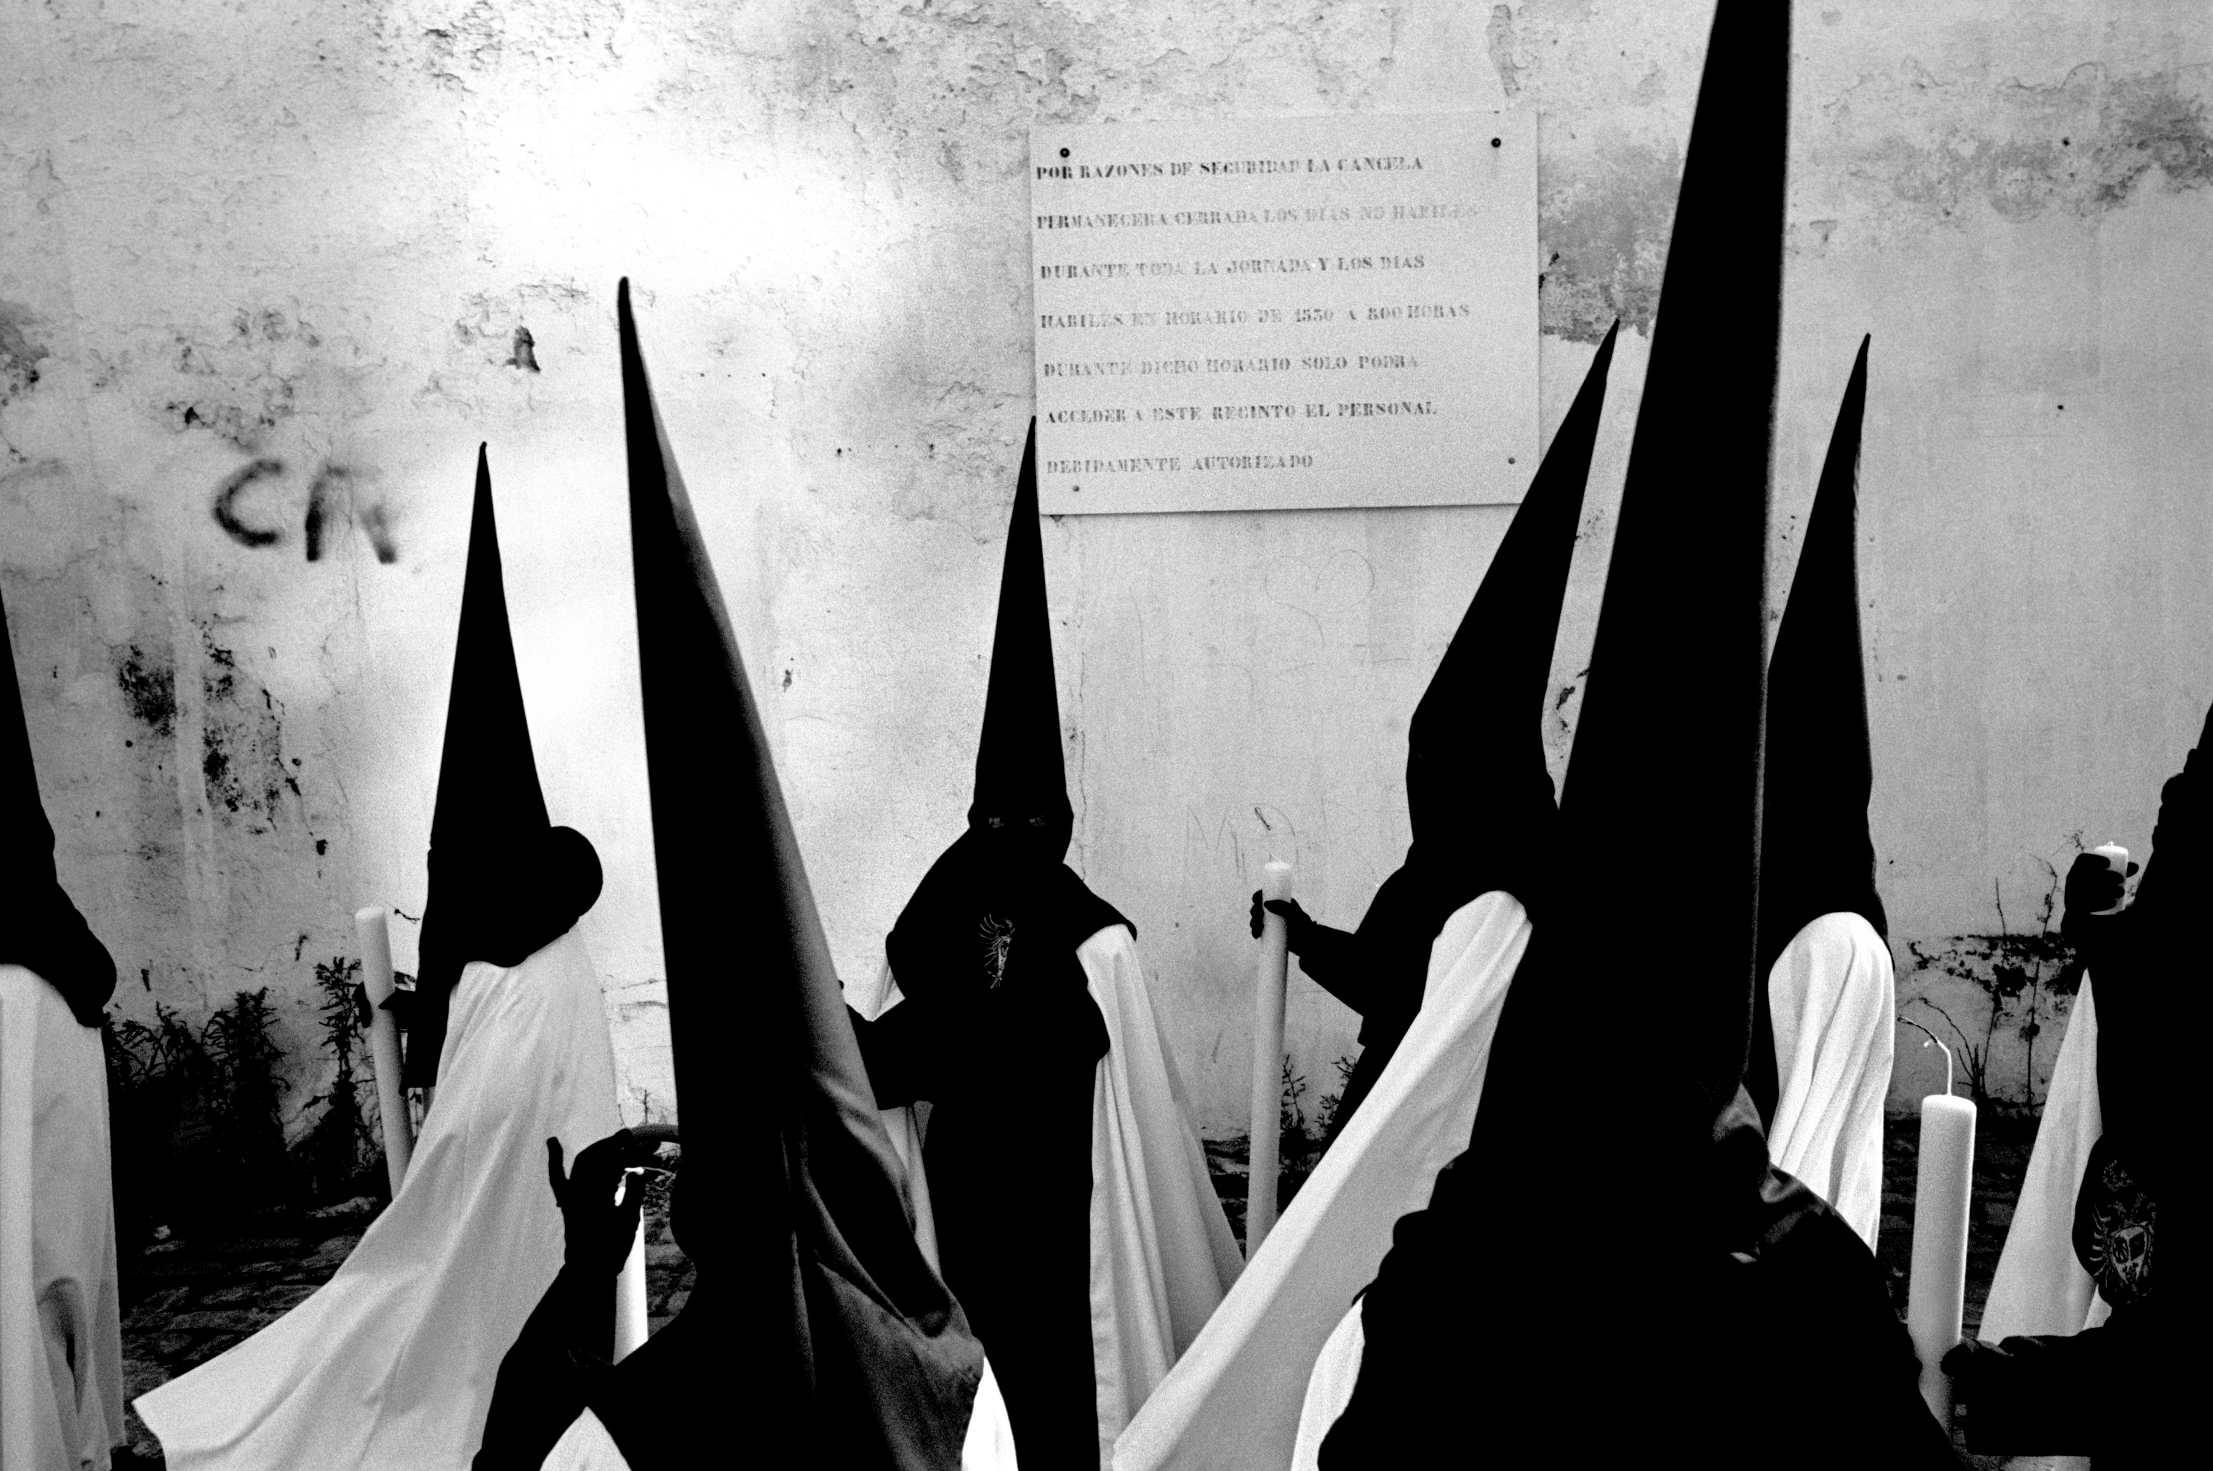 Nazarenos' Easter procession, Spain. 1995